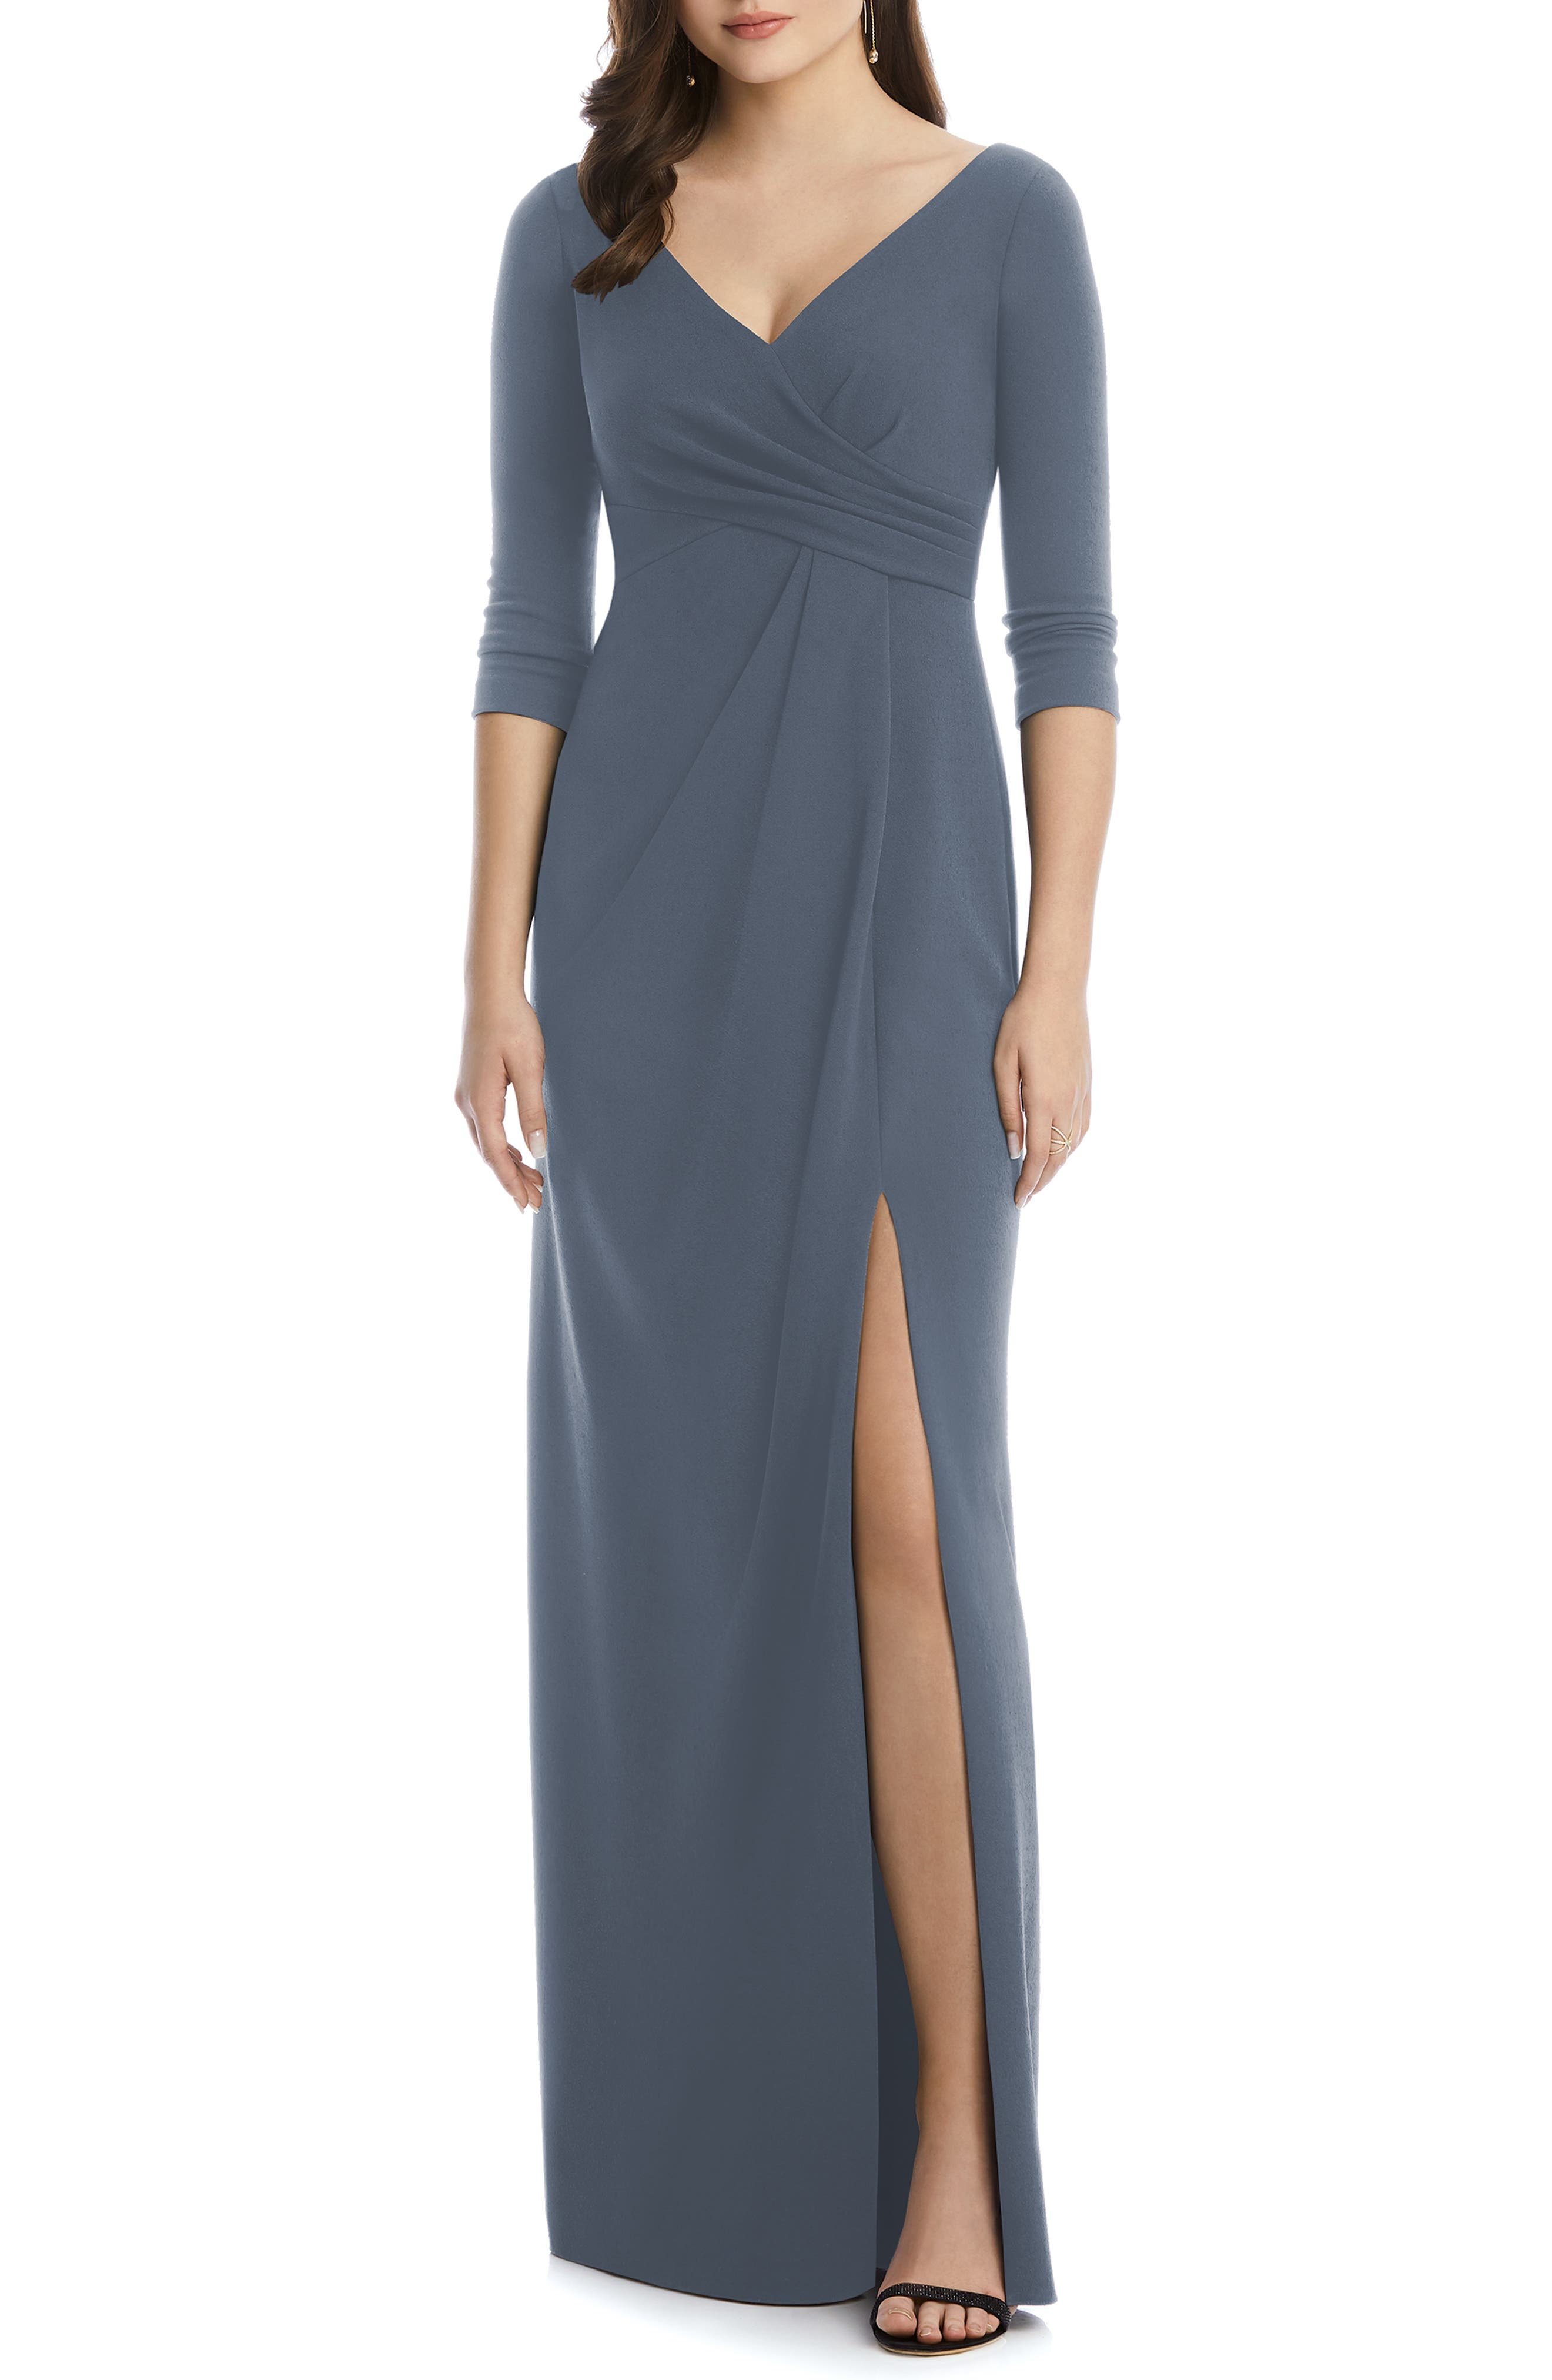 After Six Crisscross Stretch Crepe Evening Dress, Grey